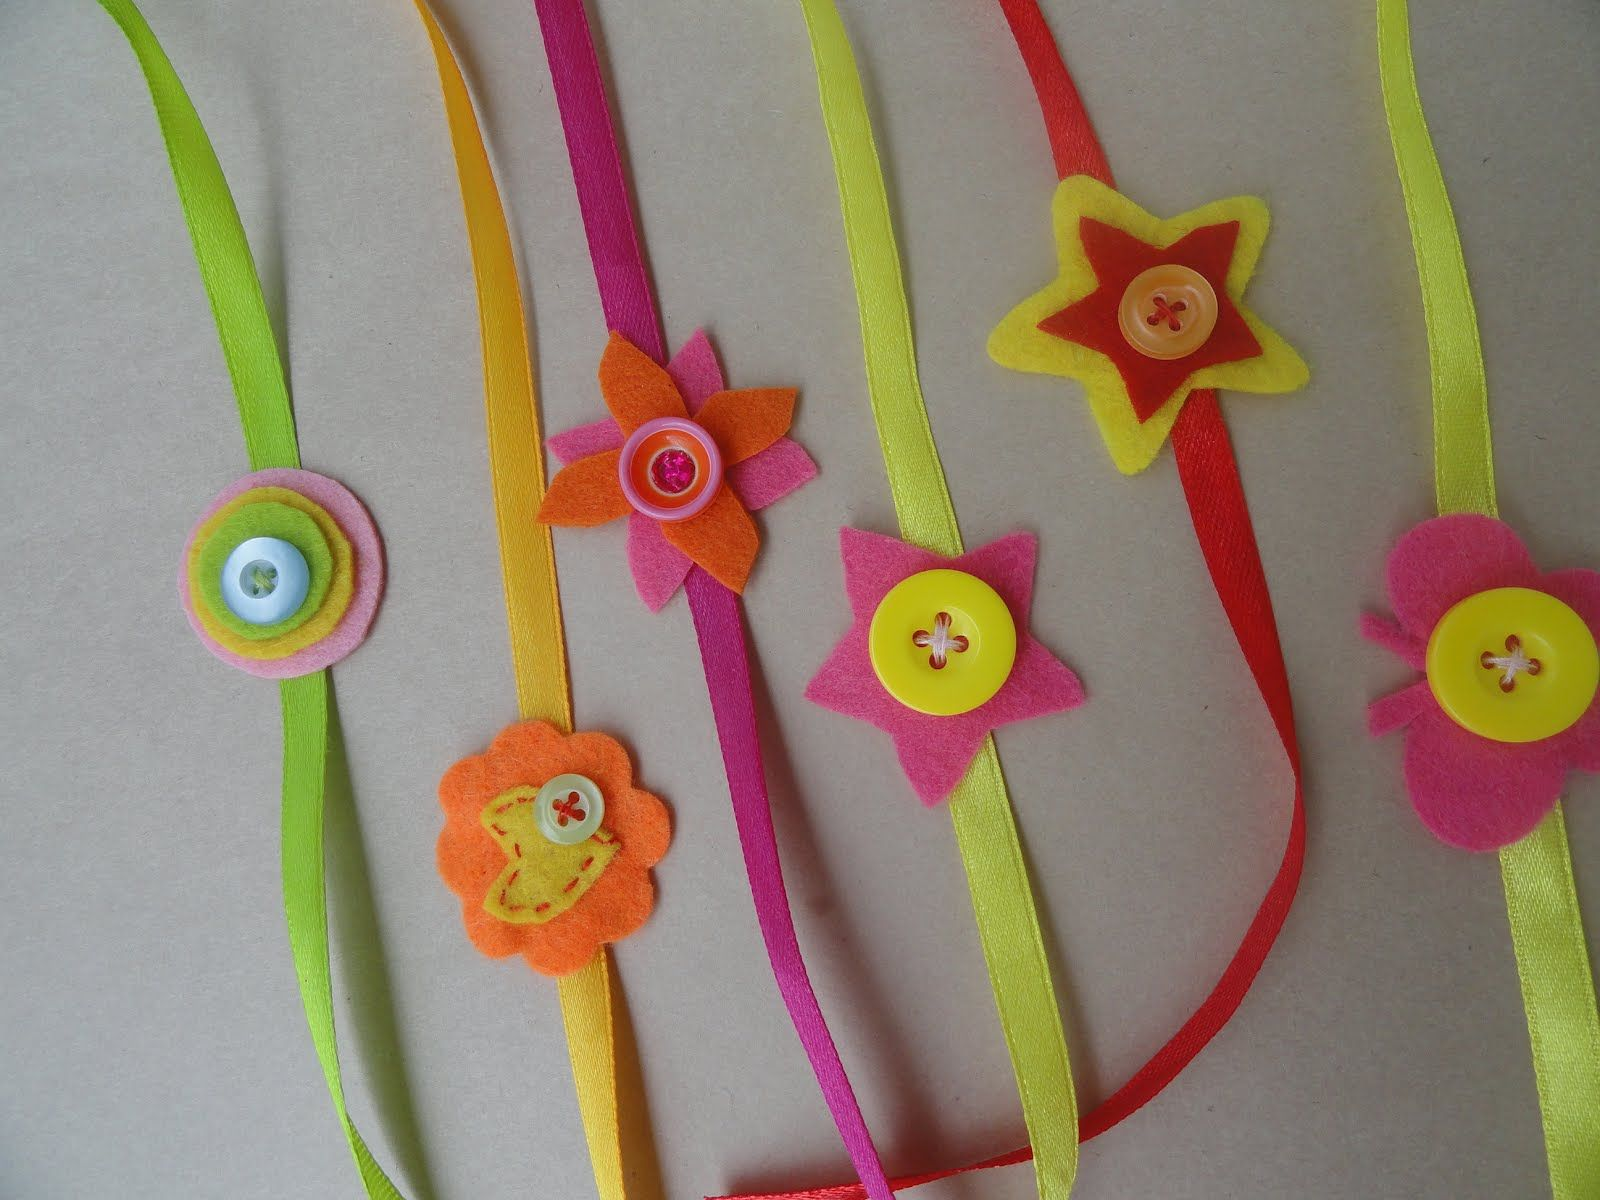 Card Making Ideas For Raksha Bandhan Part - 25: Cute Handmade Rakhis With Buttons - We Have 15 Best Ideas To Make Rakhi At  Home For Rakshabandhan - Perfect Rakhi Ideas For Kids To Make, Rakhi  Competition, ...